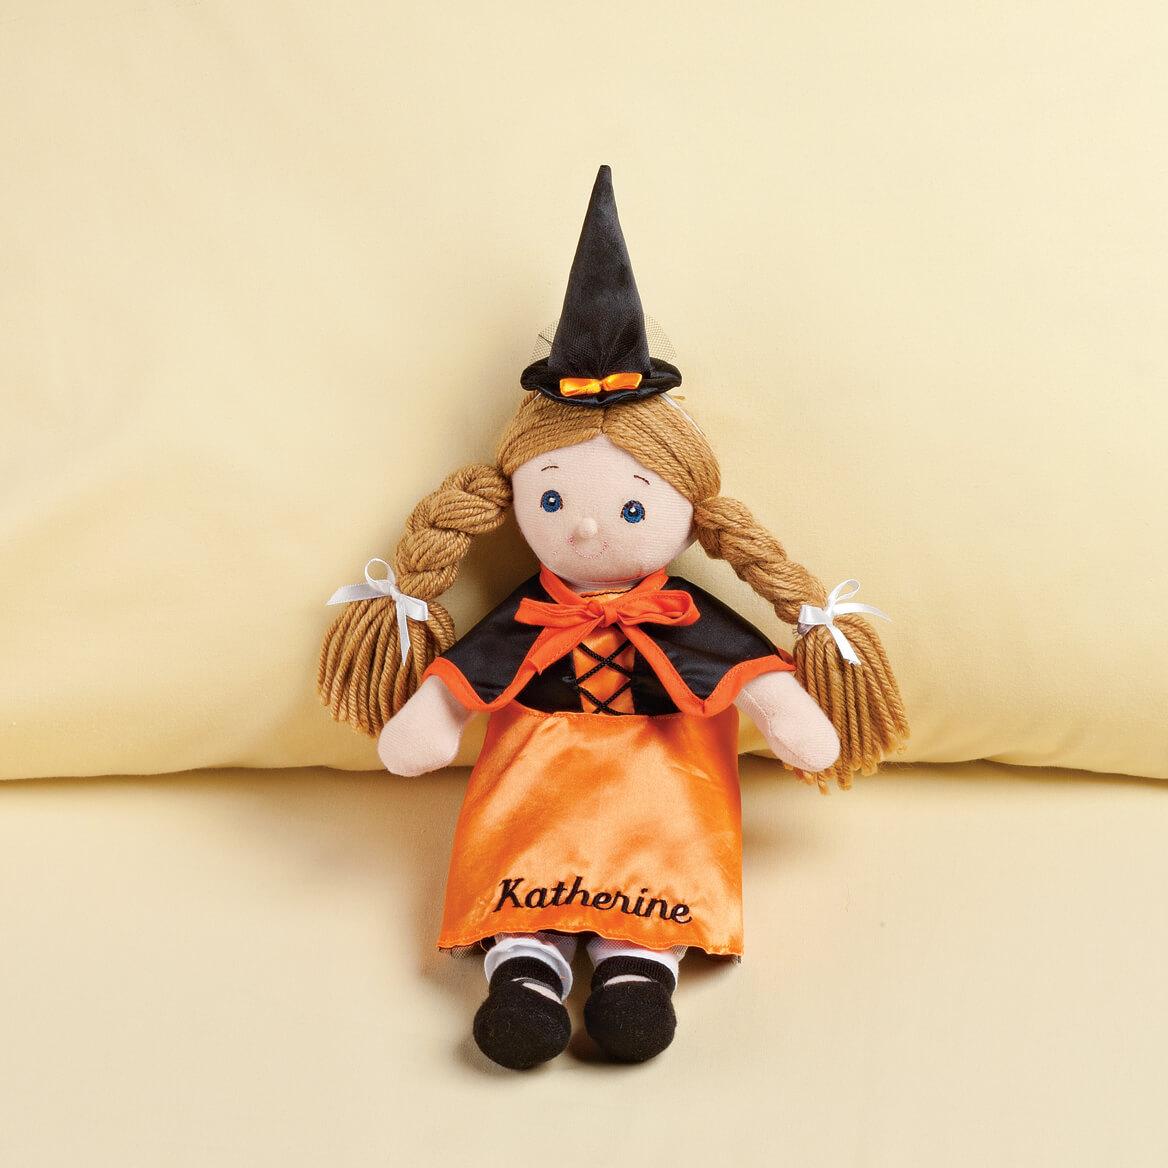 Personalized Little Sister Halloween Dress-356266